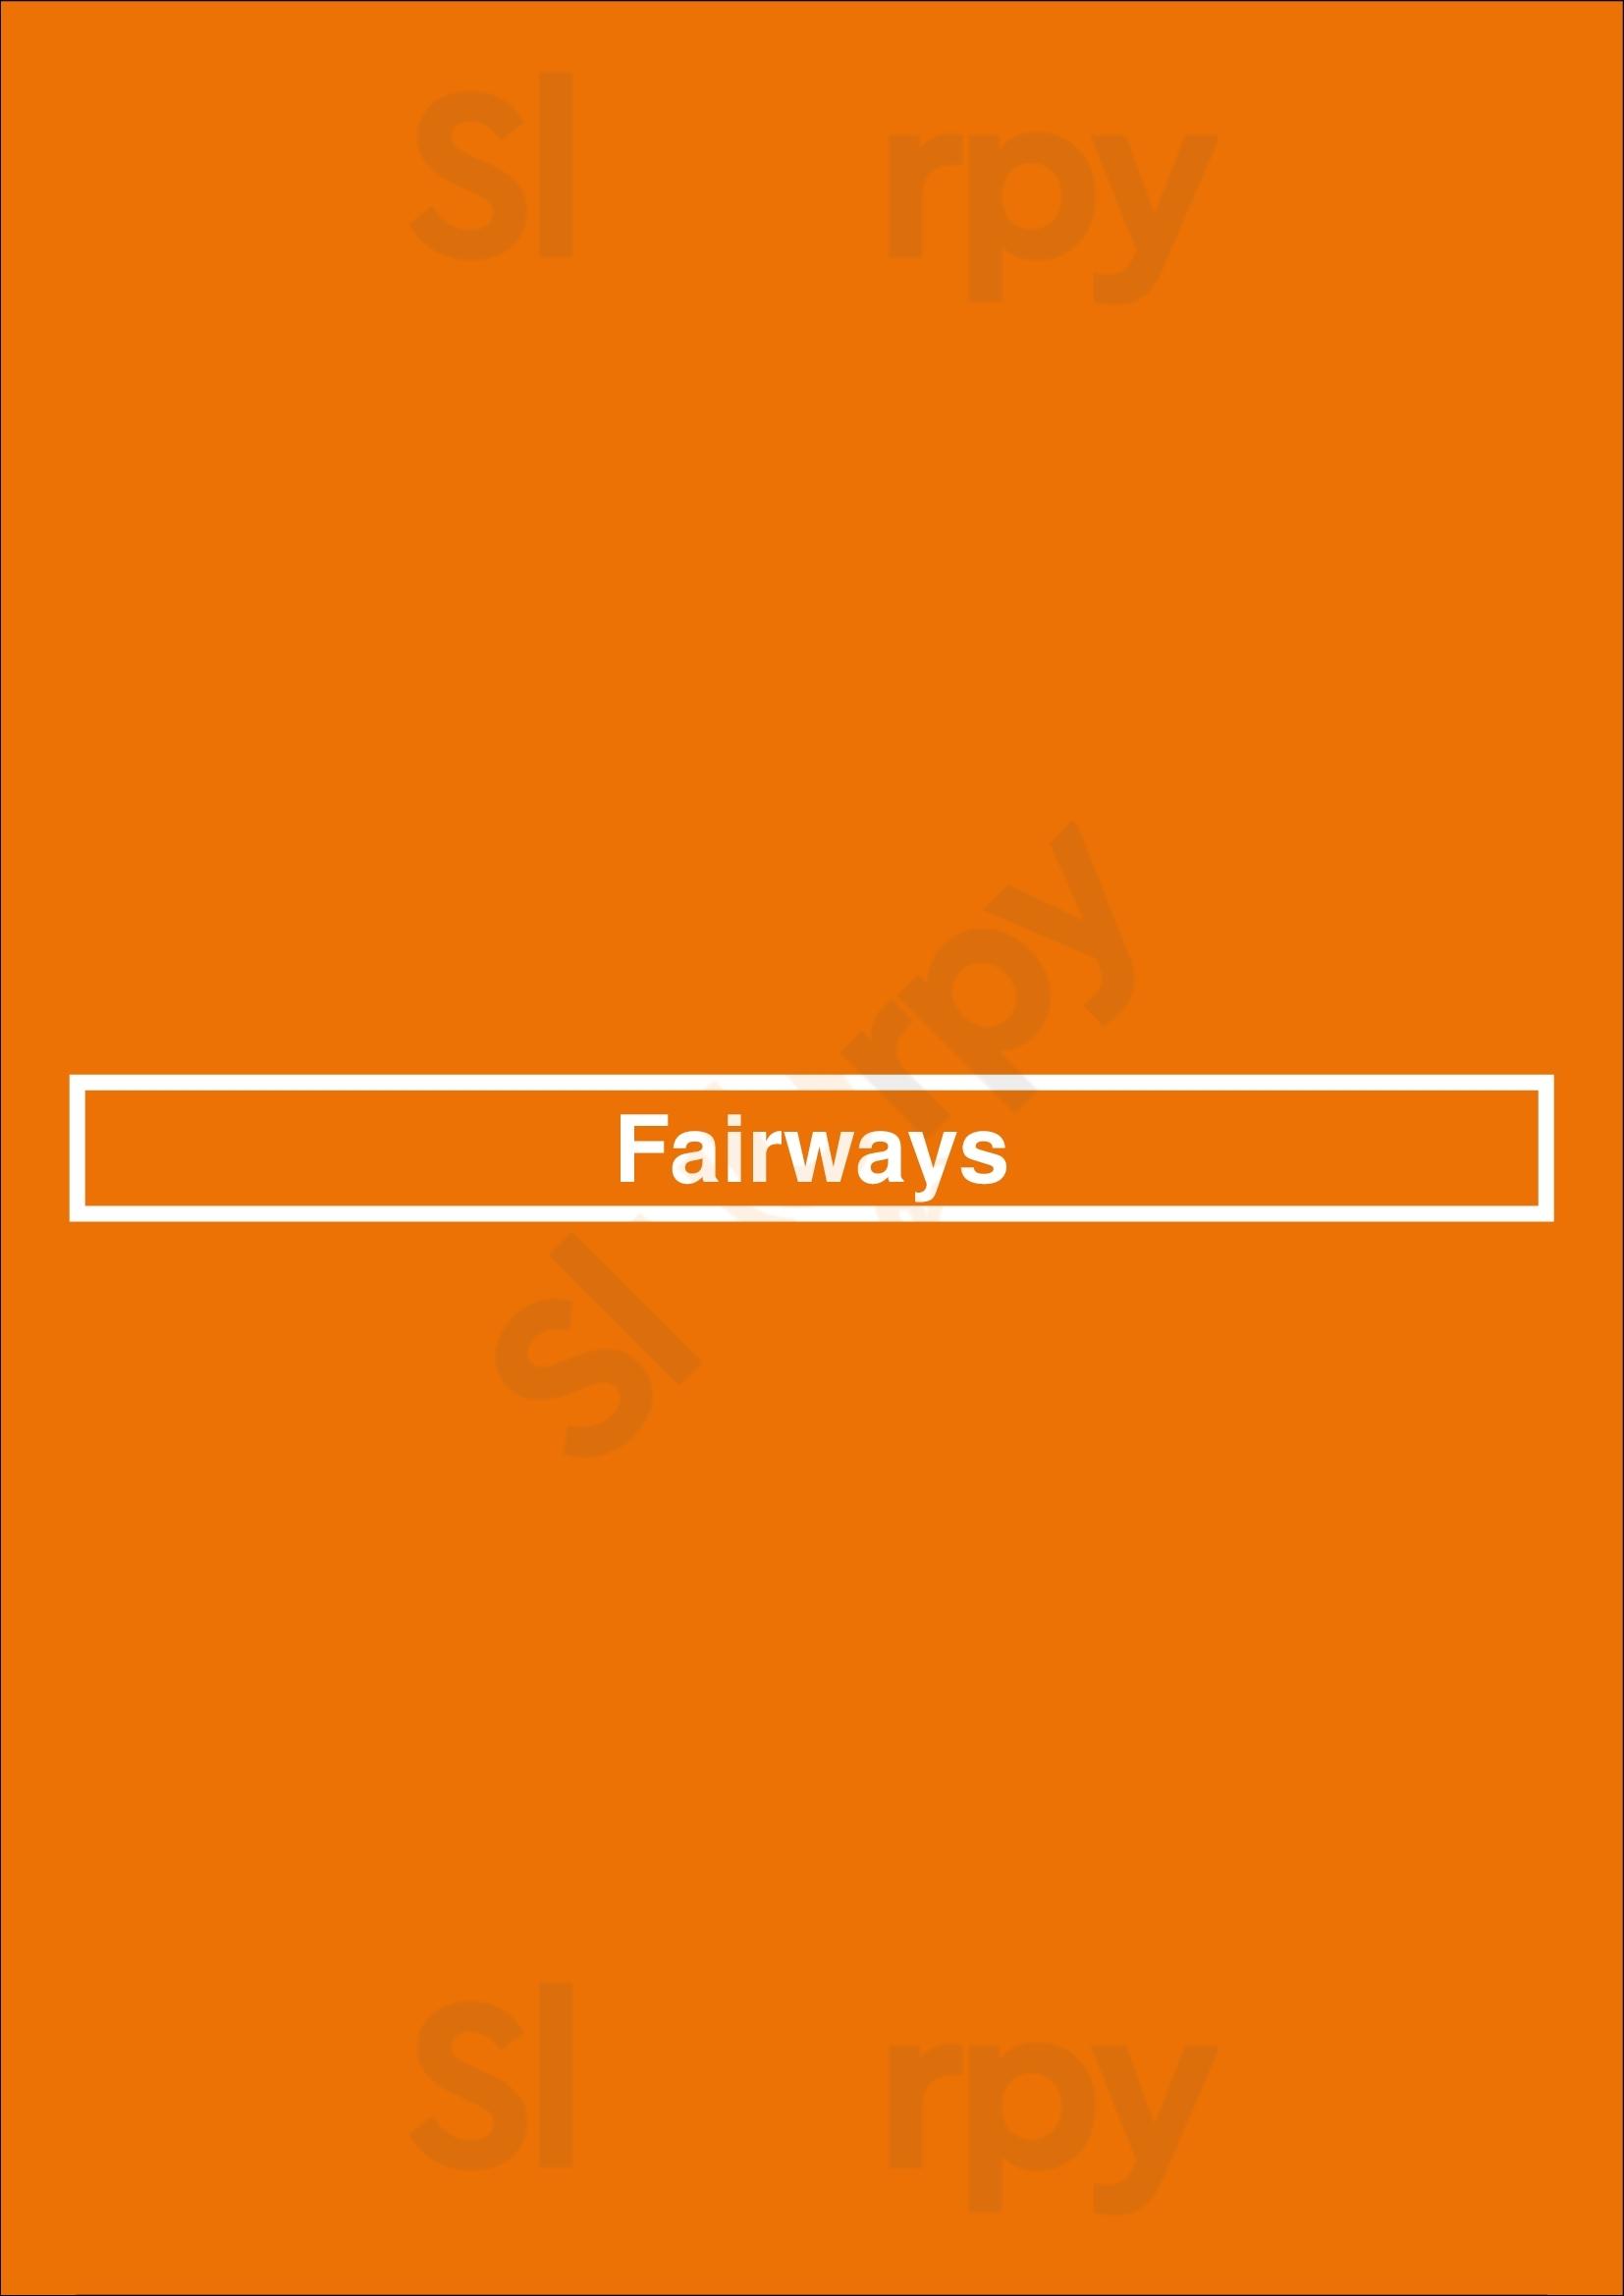 Fairways Vilamoura  Menu - 1